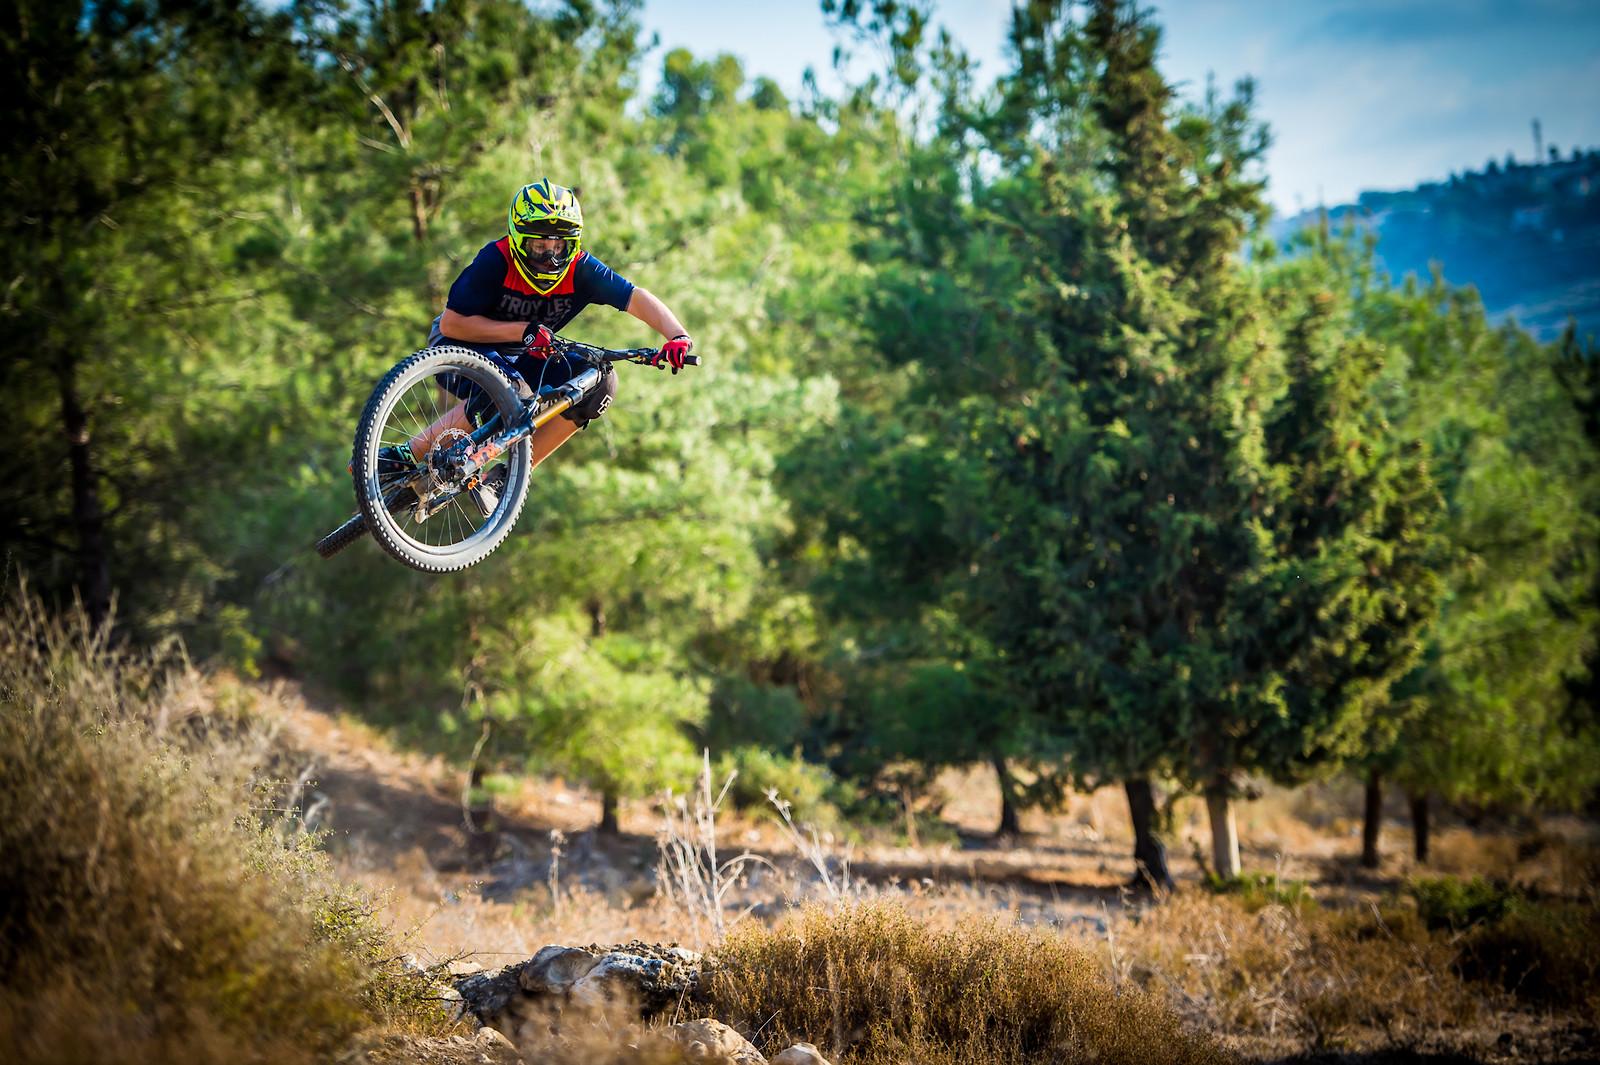 Table Time - iceman2058 - Mountain Biking Pictures - Vital MTB